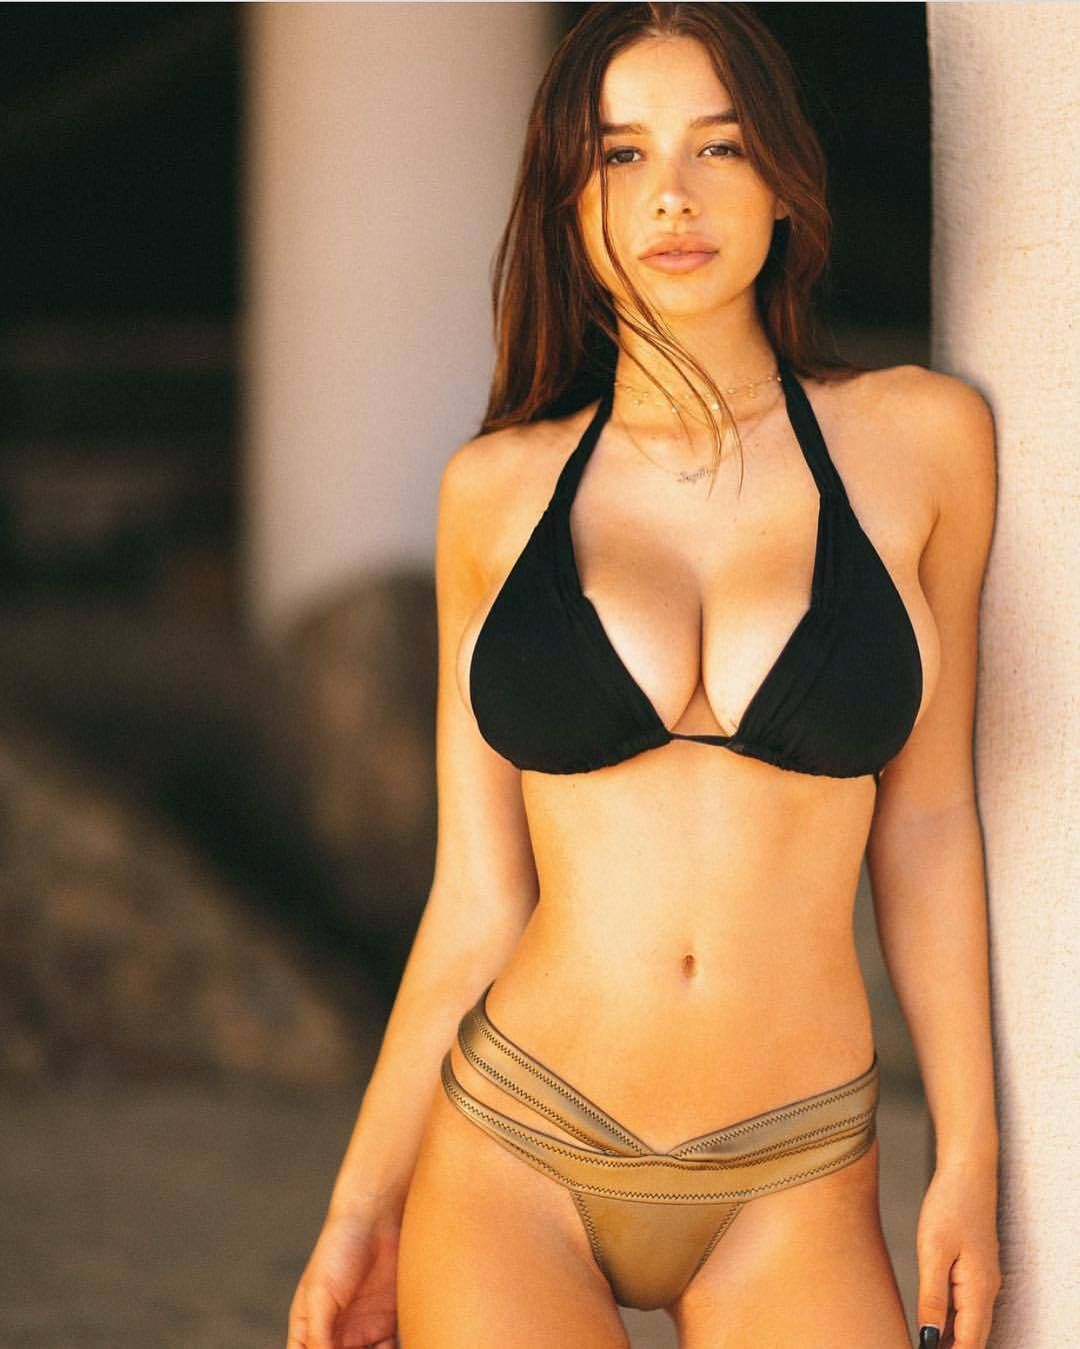 How Is She Real Sexy Pussy In 2019 Bikini Girls Bikinis